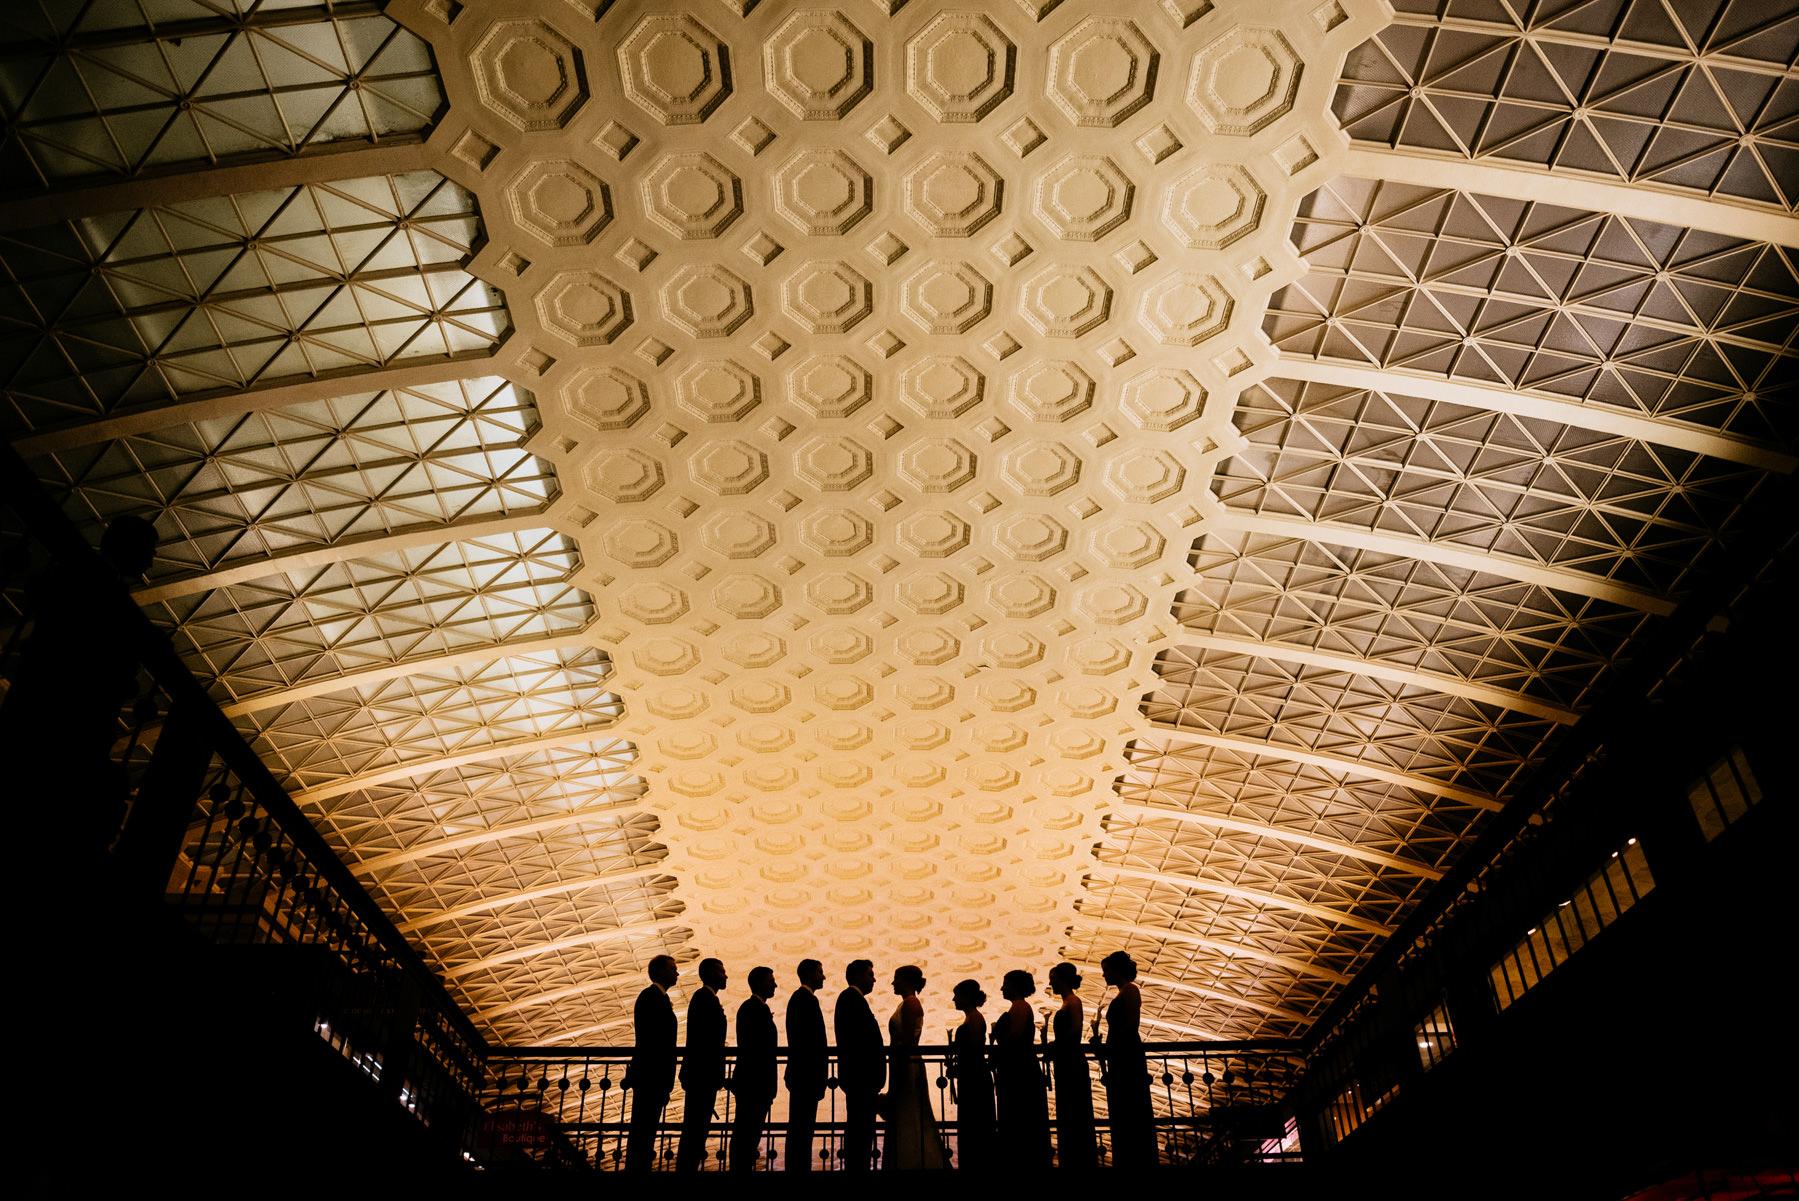 creative silhouette inside union station washington dc